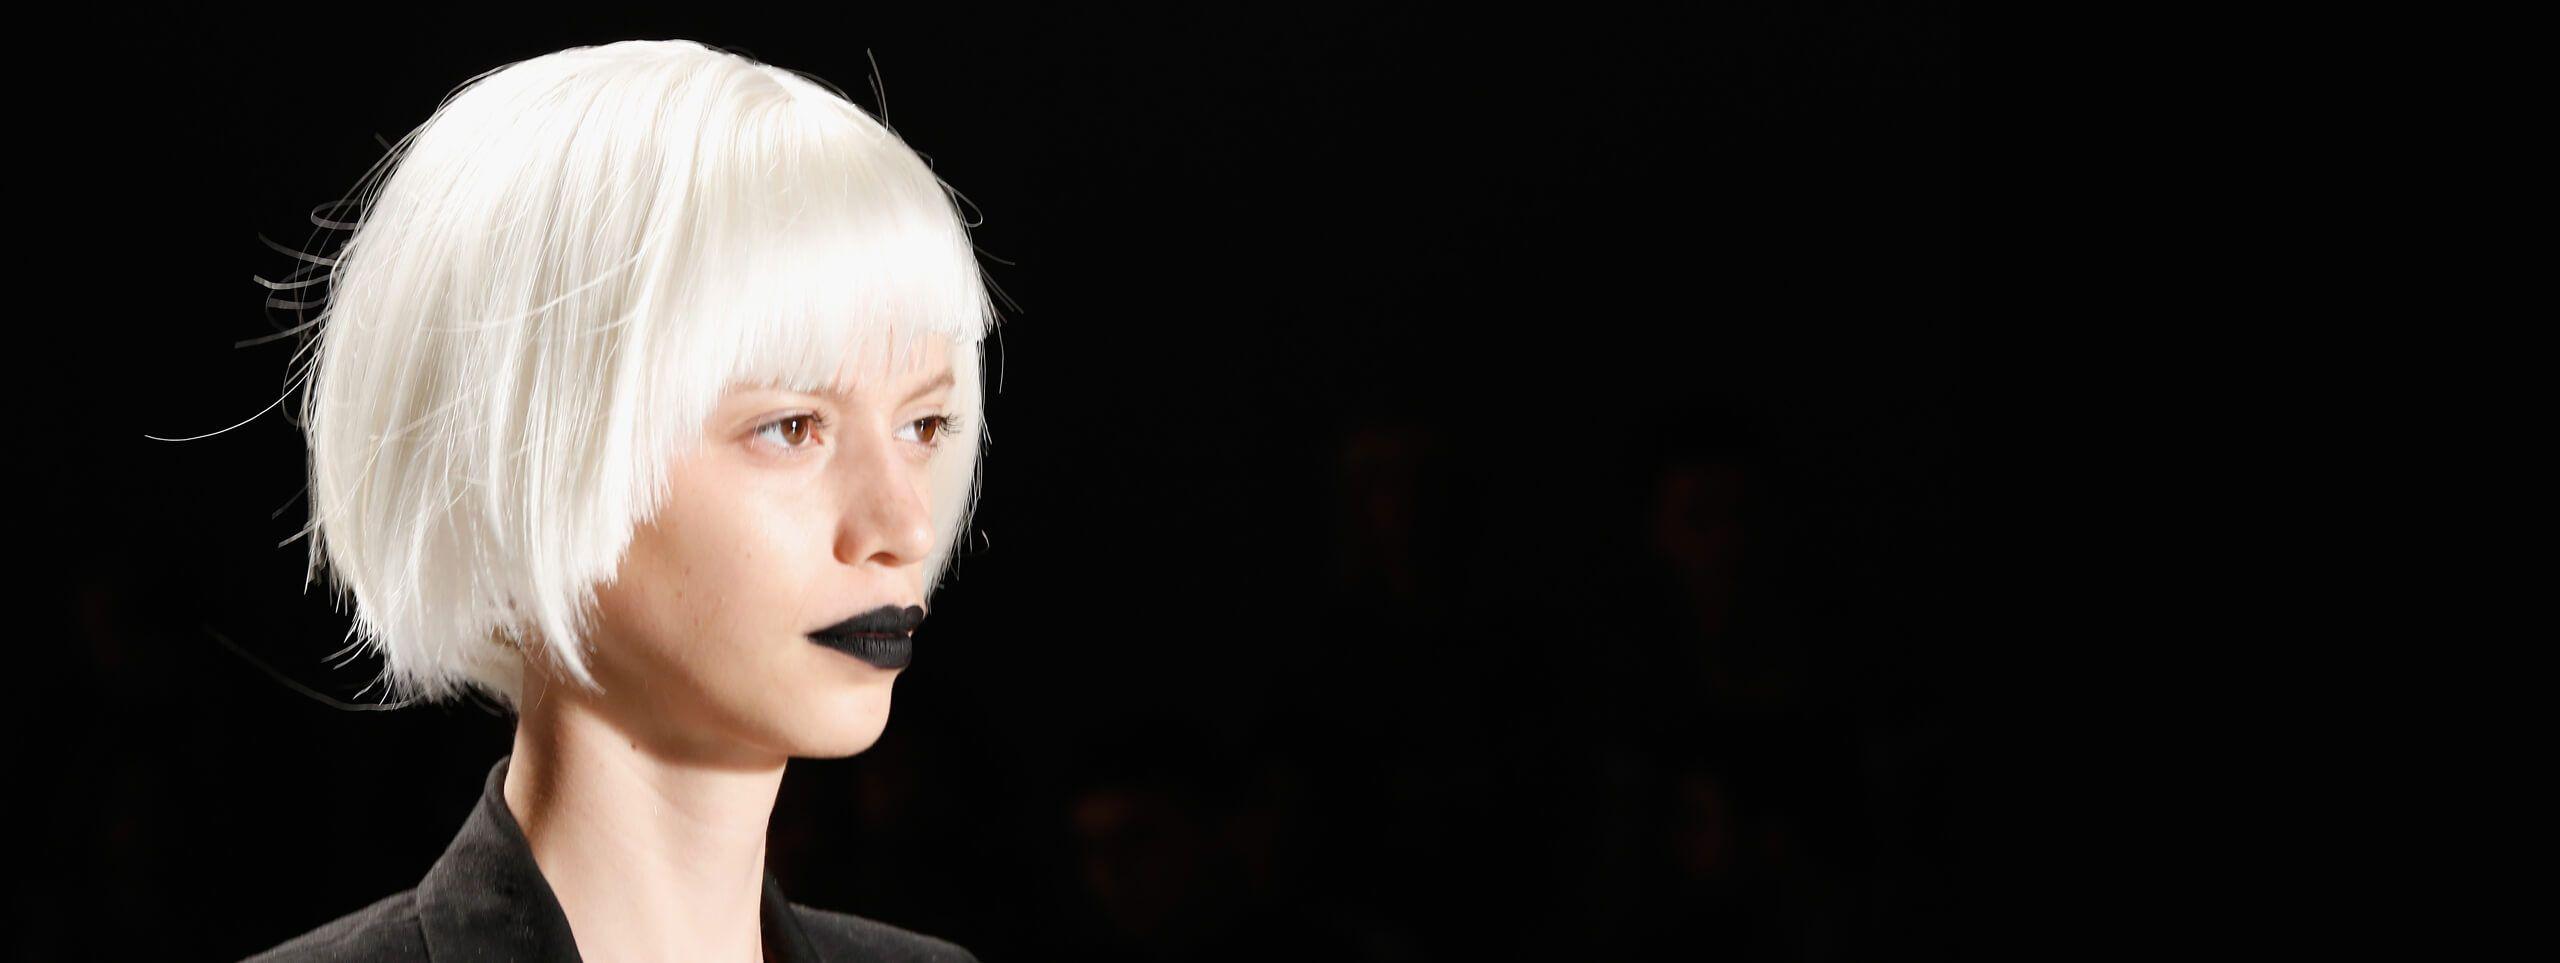 Modelo color de pelo blanco